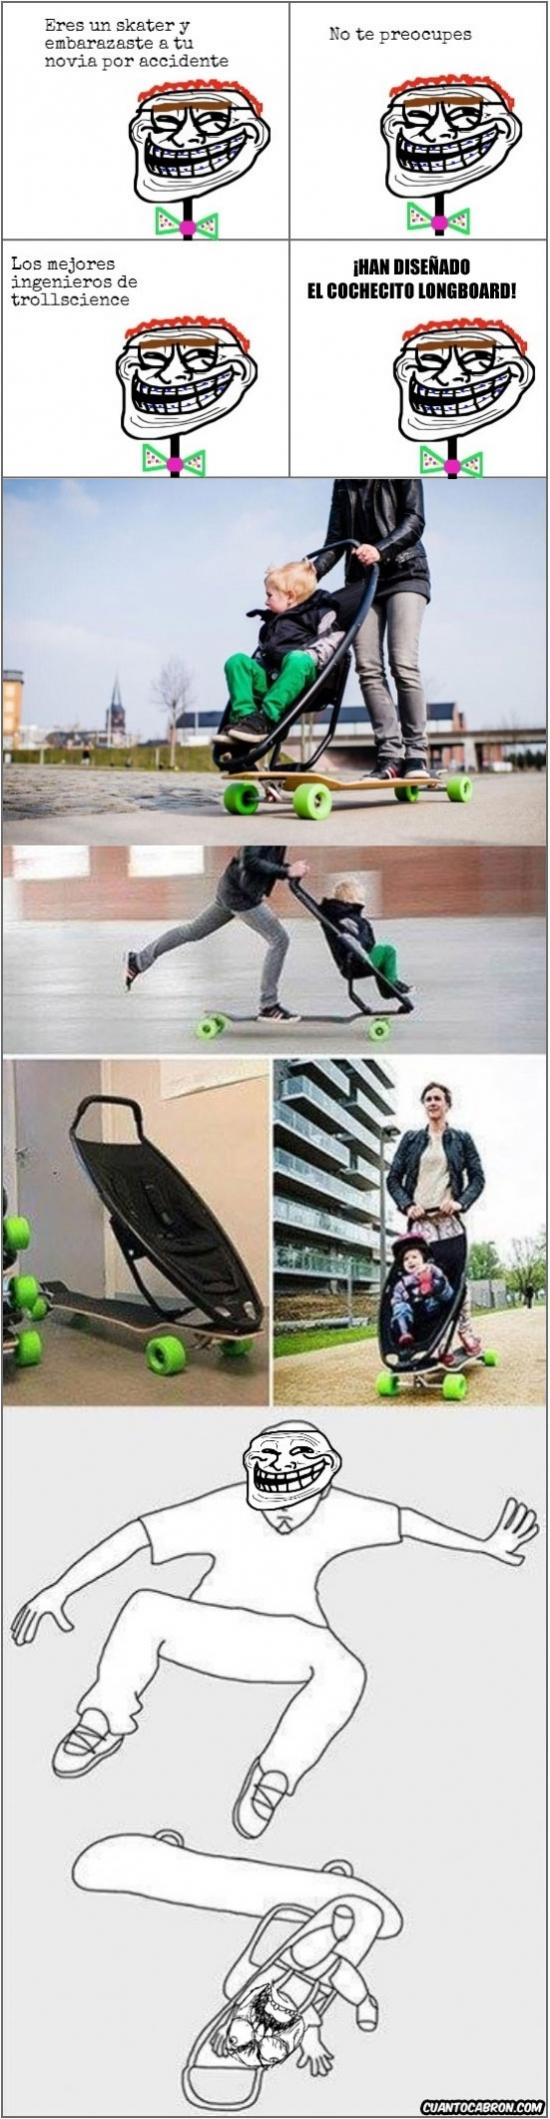 Trollface - ¿Vas a ser padre y te gusta el longboard?